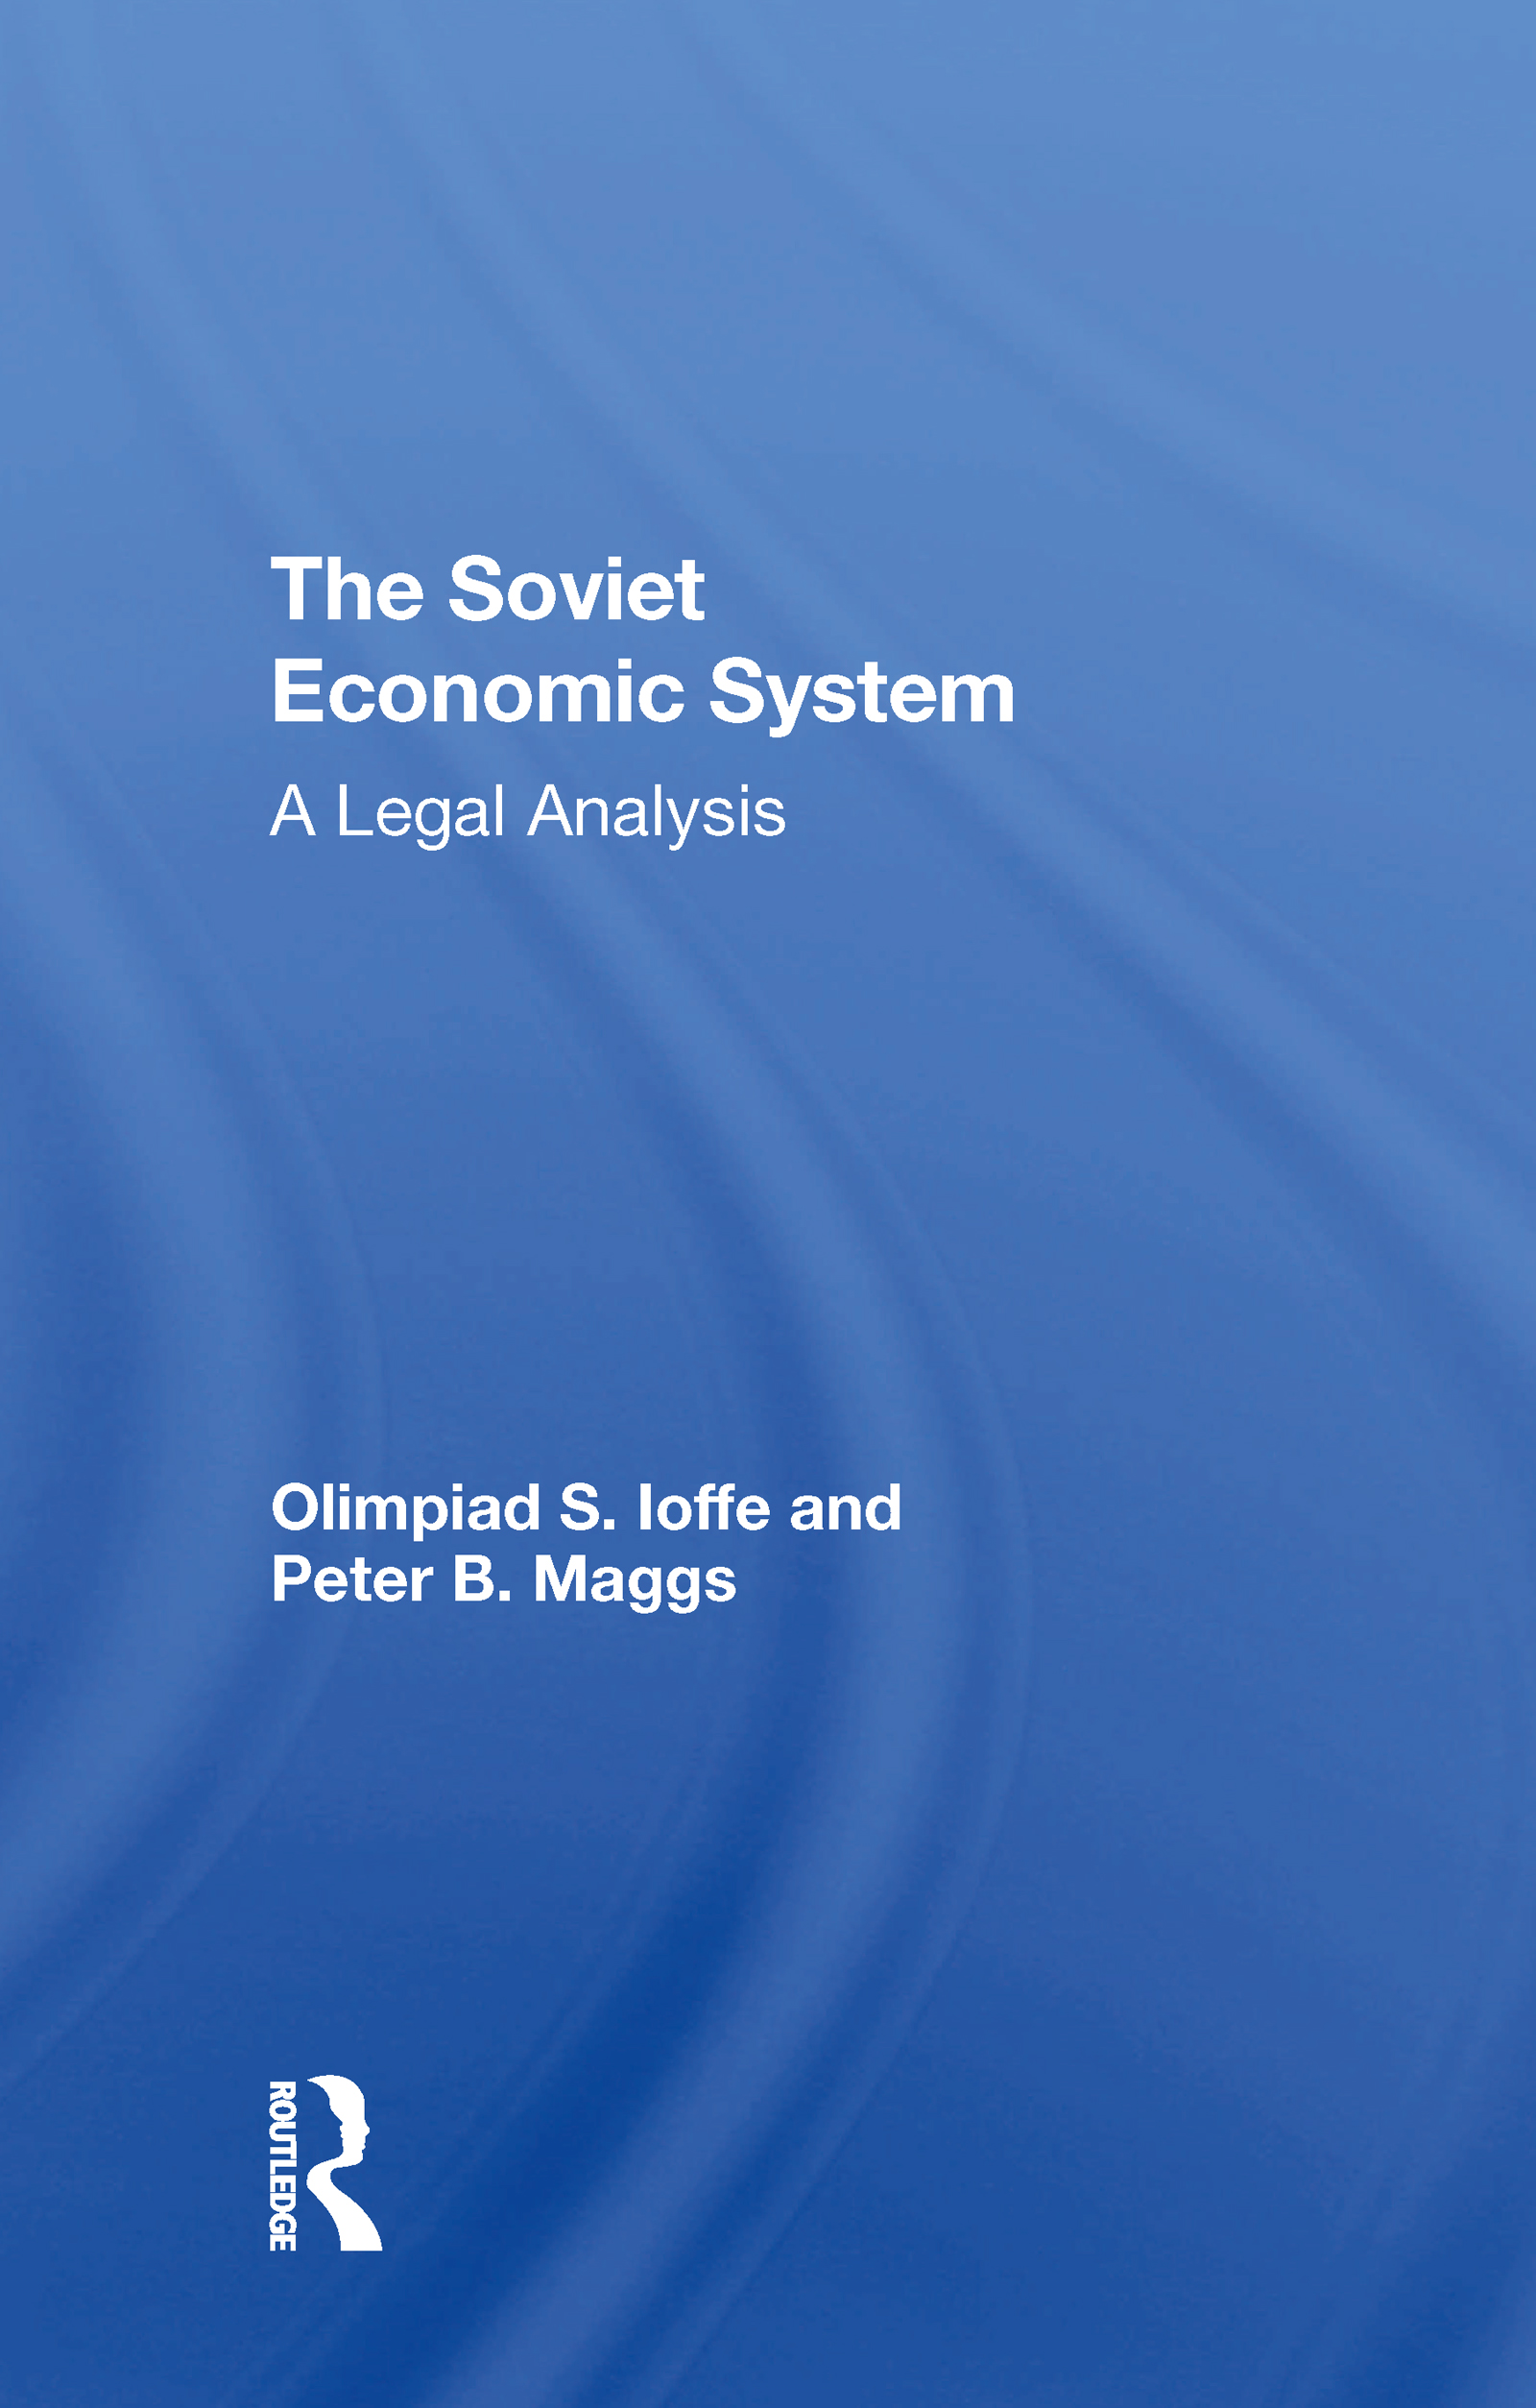 The Soviet Economic System